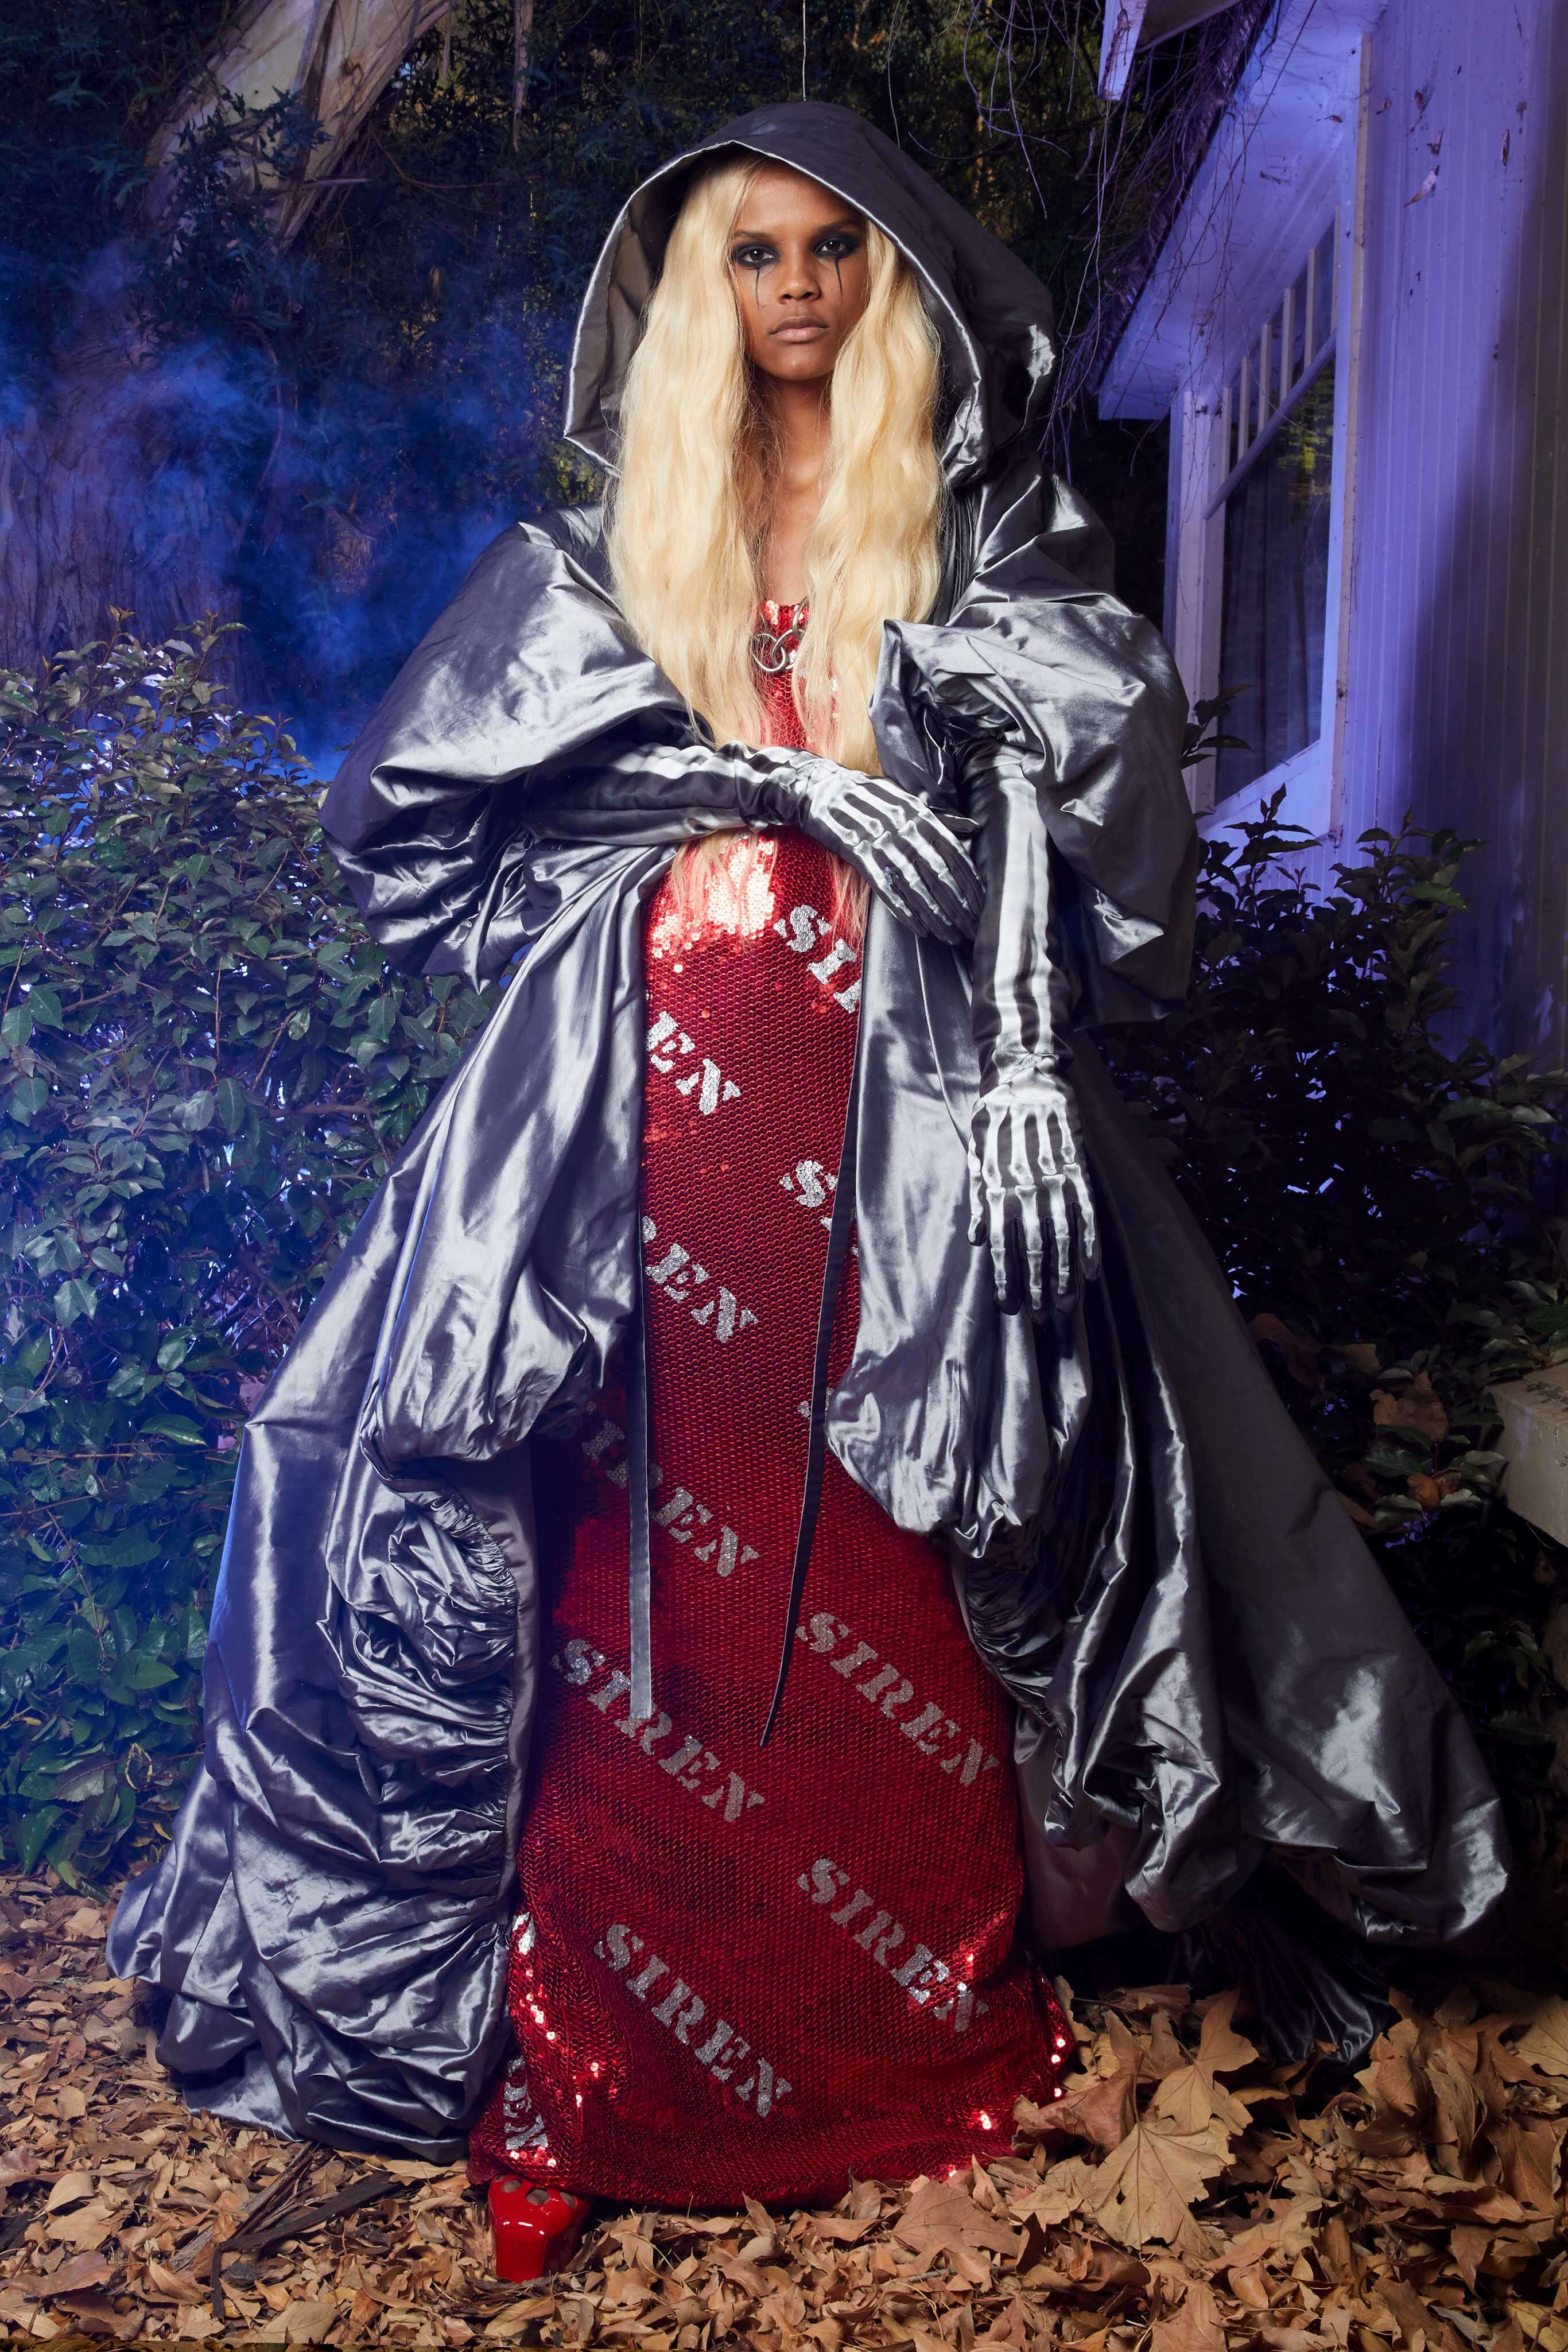 Woman Resort 2020 Moschino Show Los Angeles Fashion Show